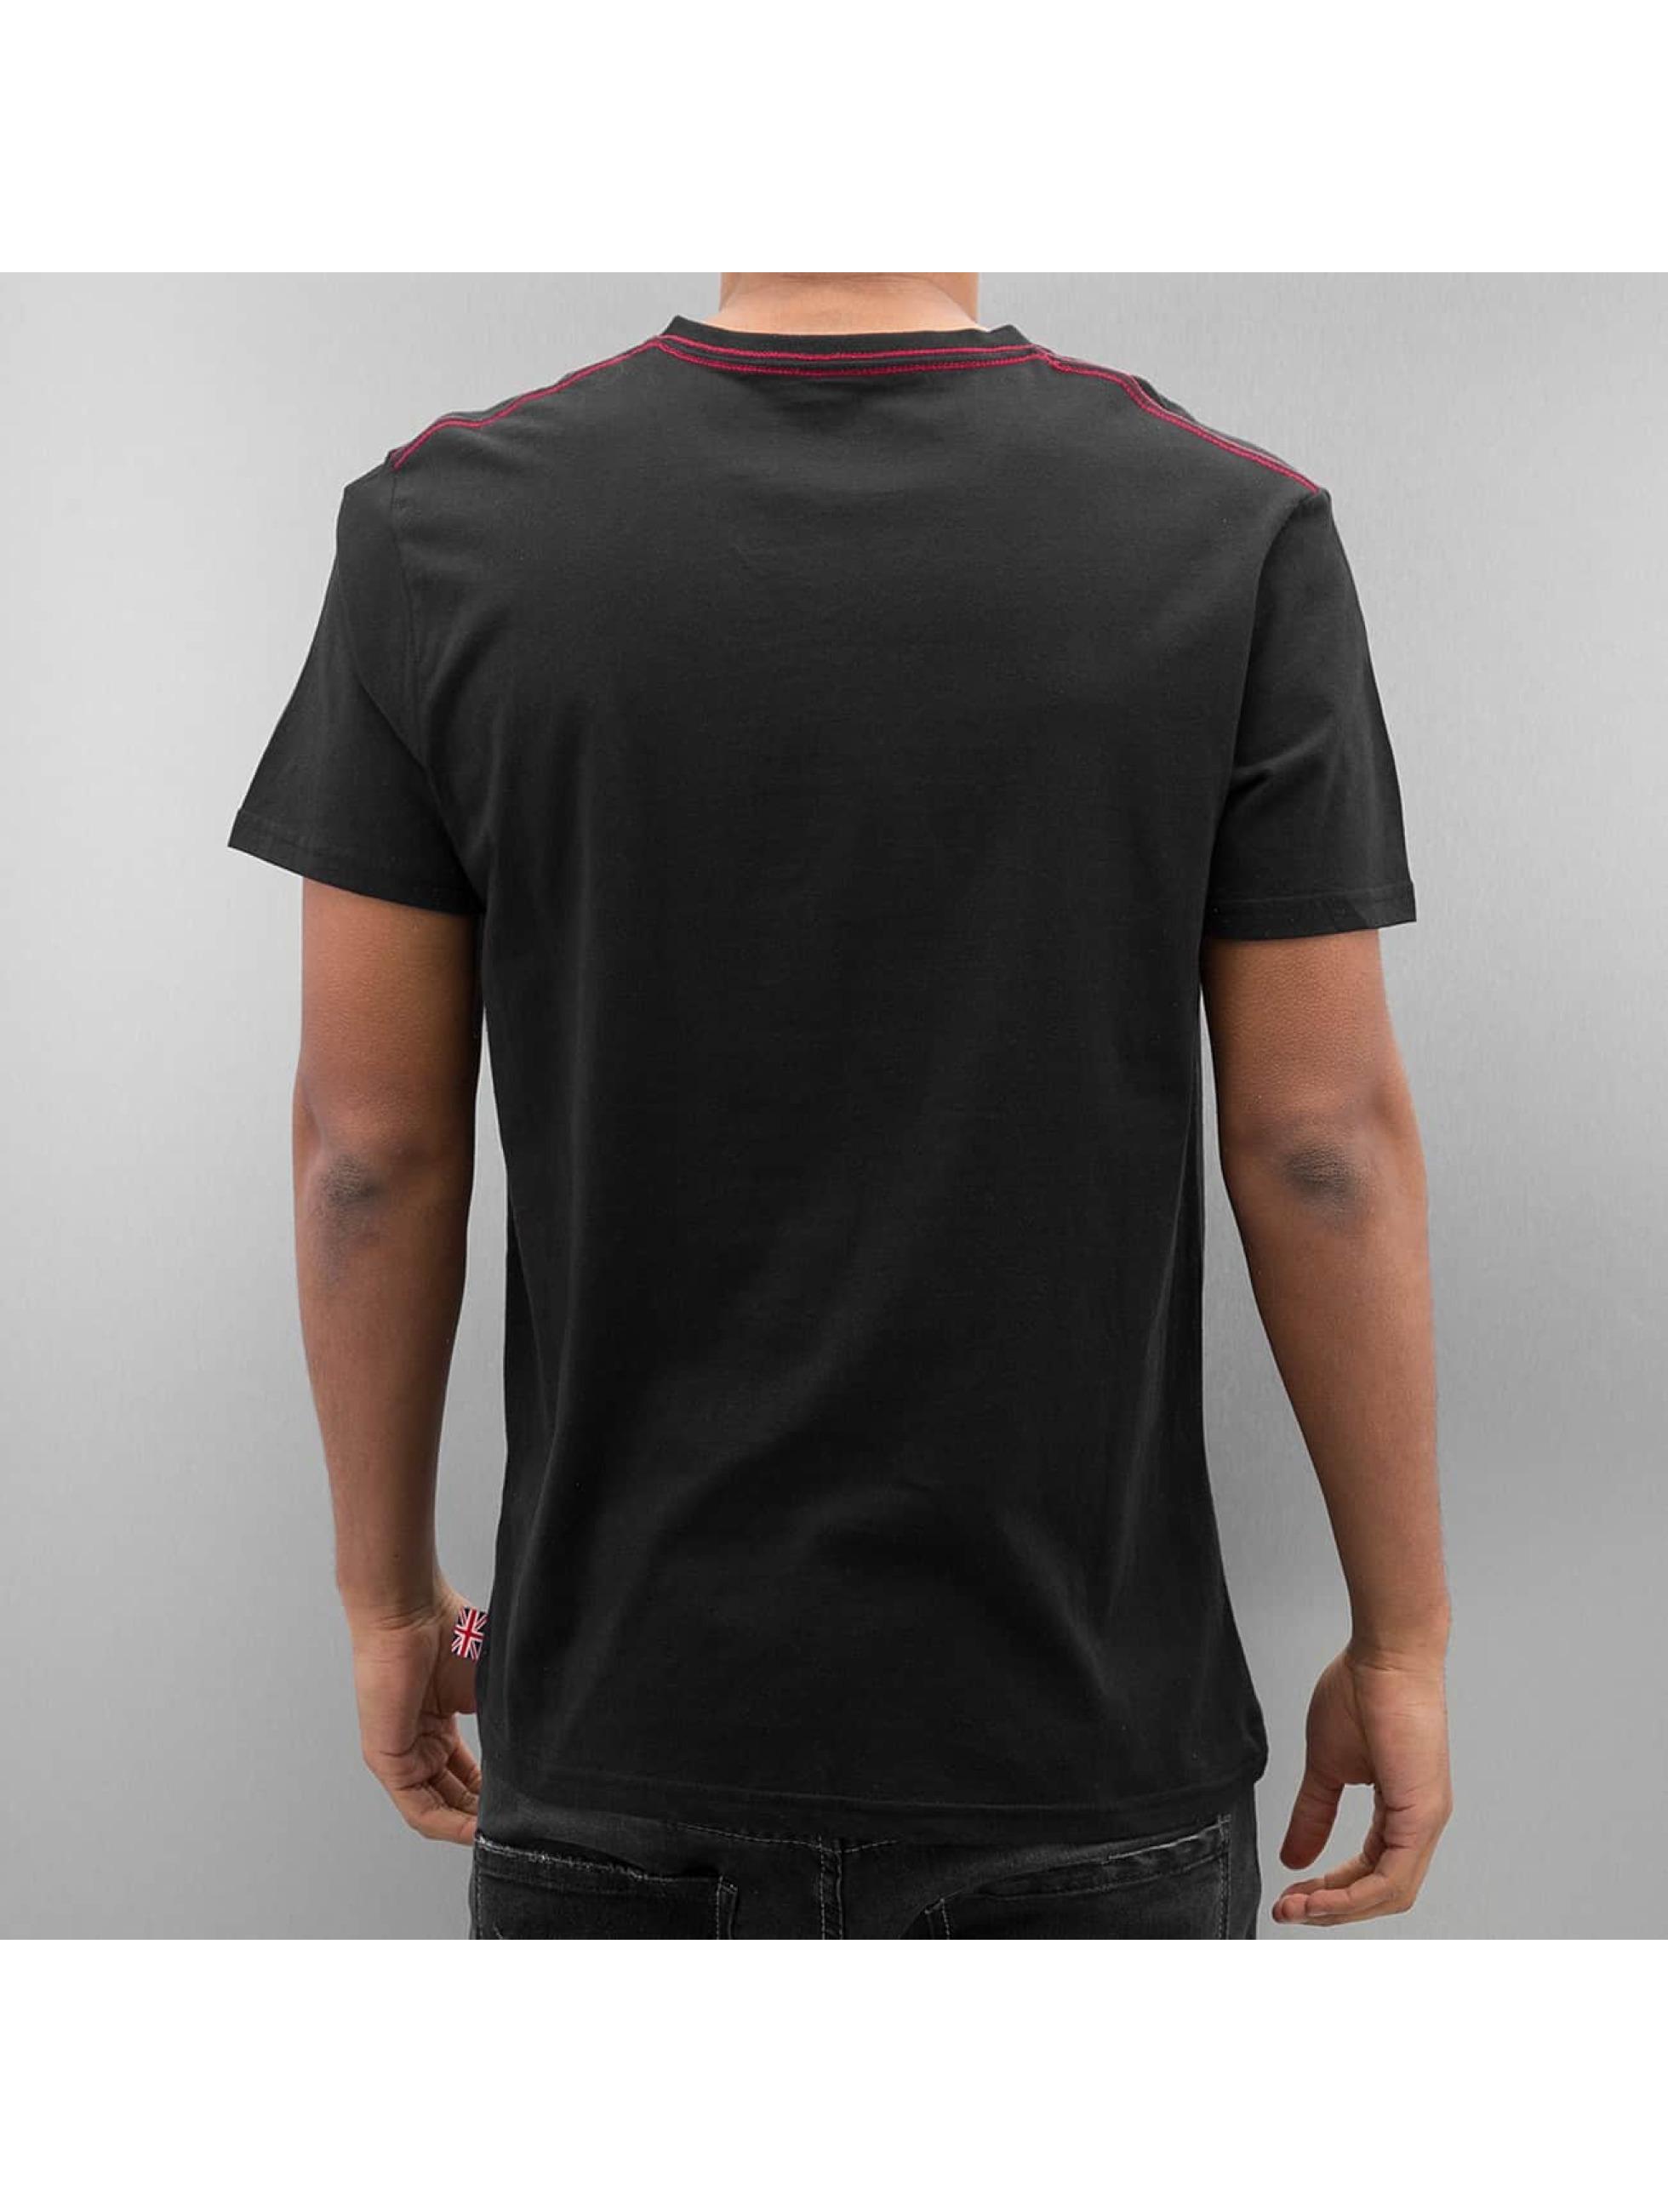 Lonsdale-London-Uomini-Maglieria-T-shirt-Denholm-nero-316120-S